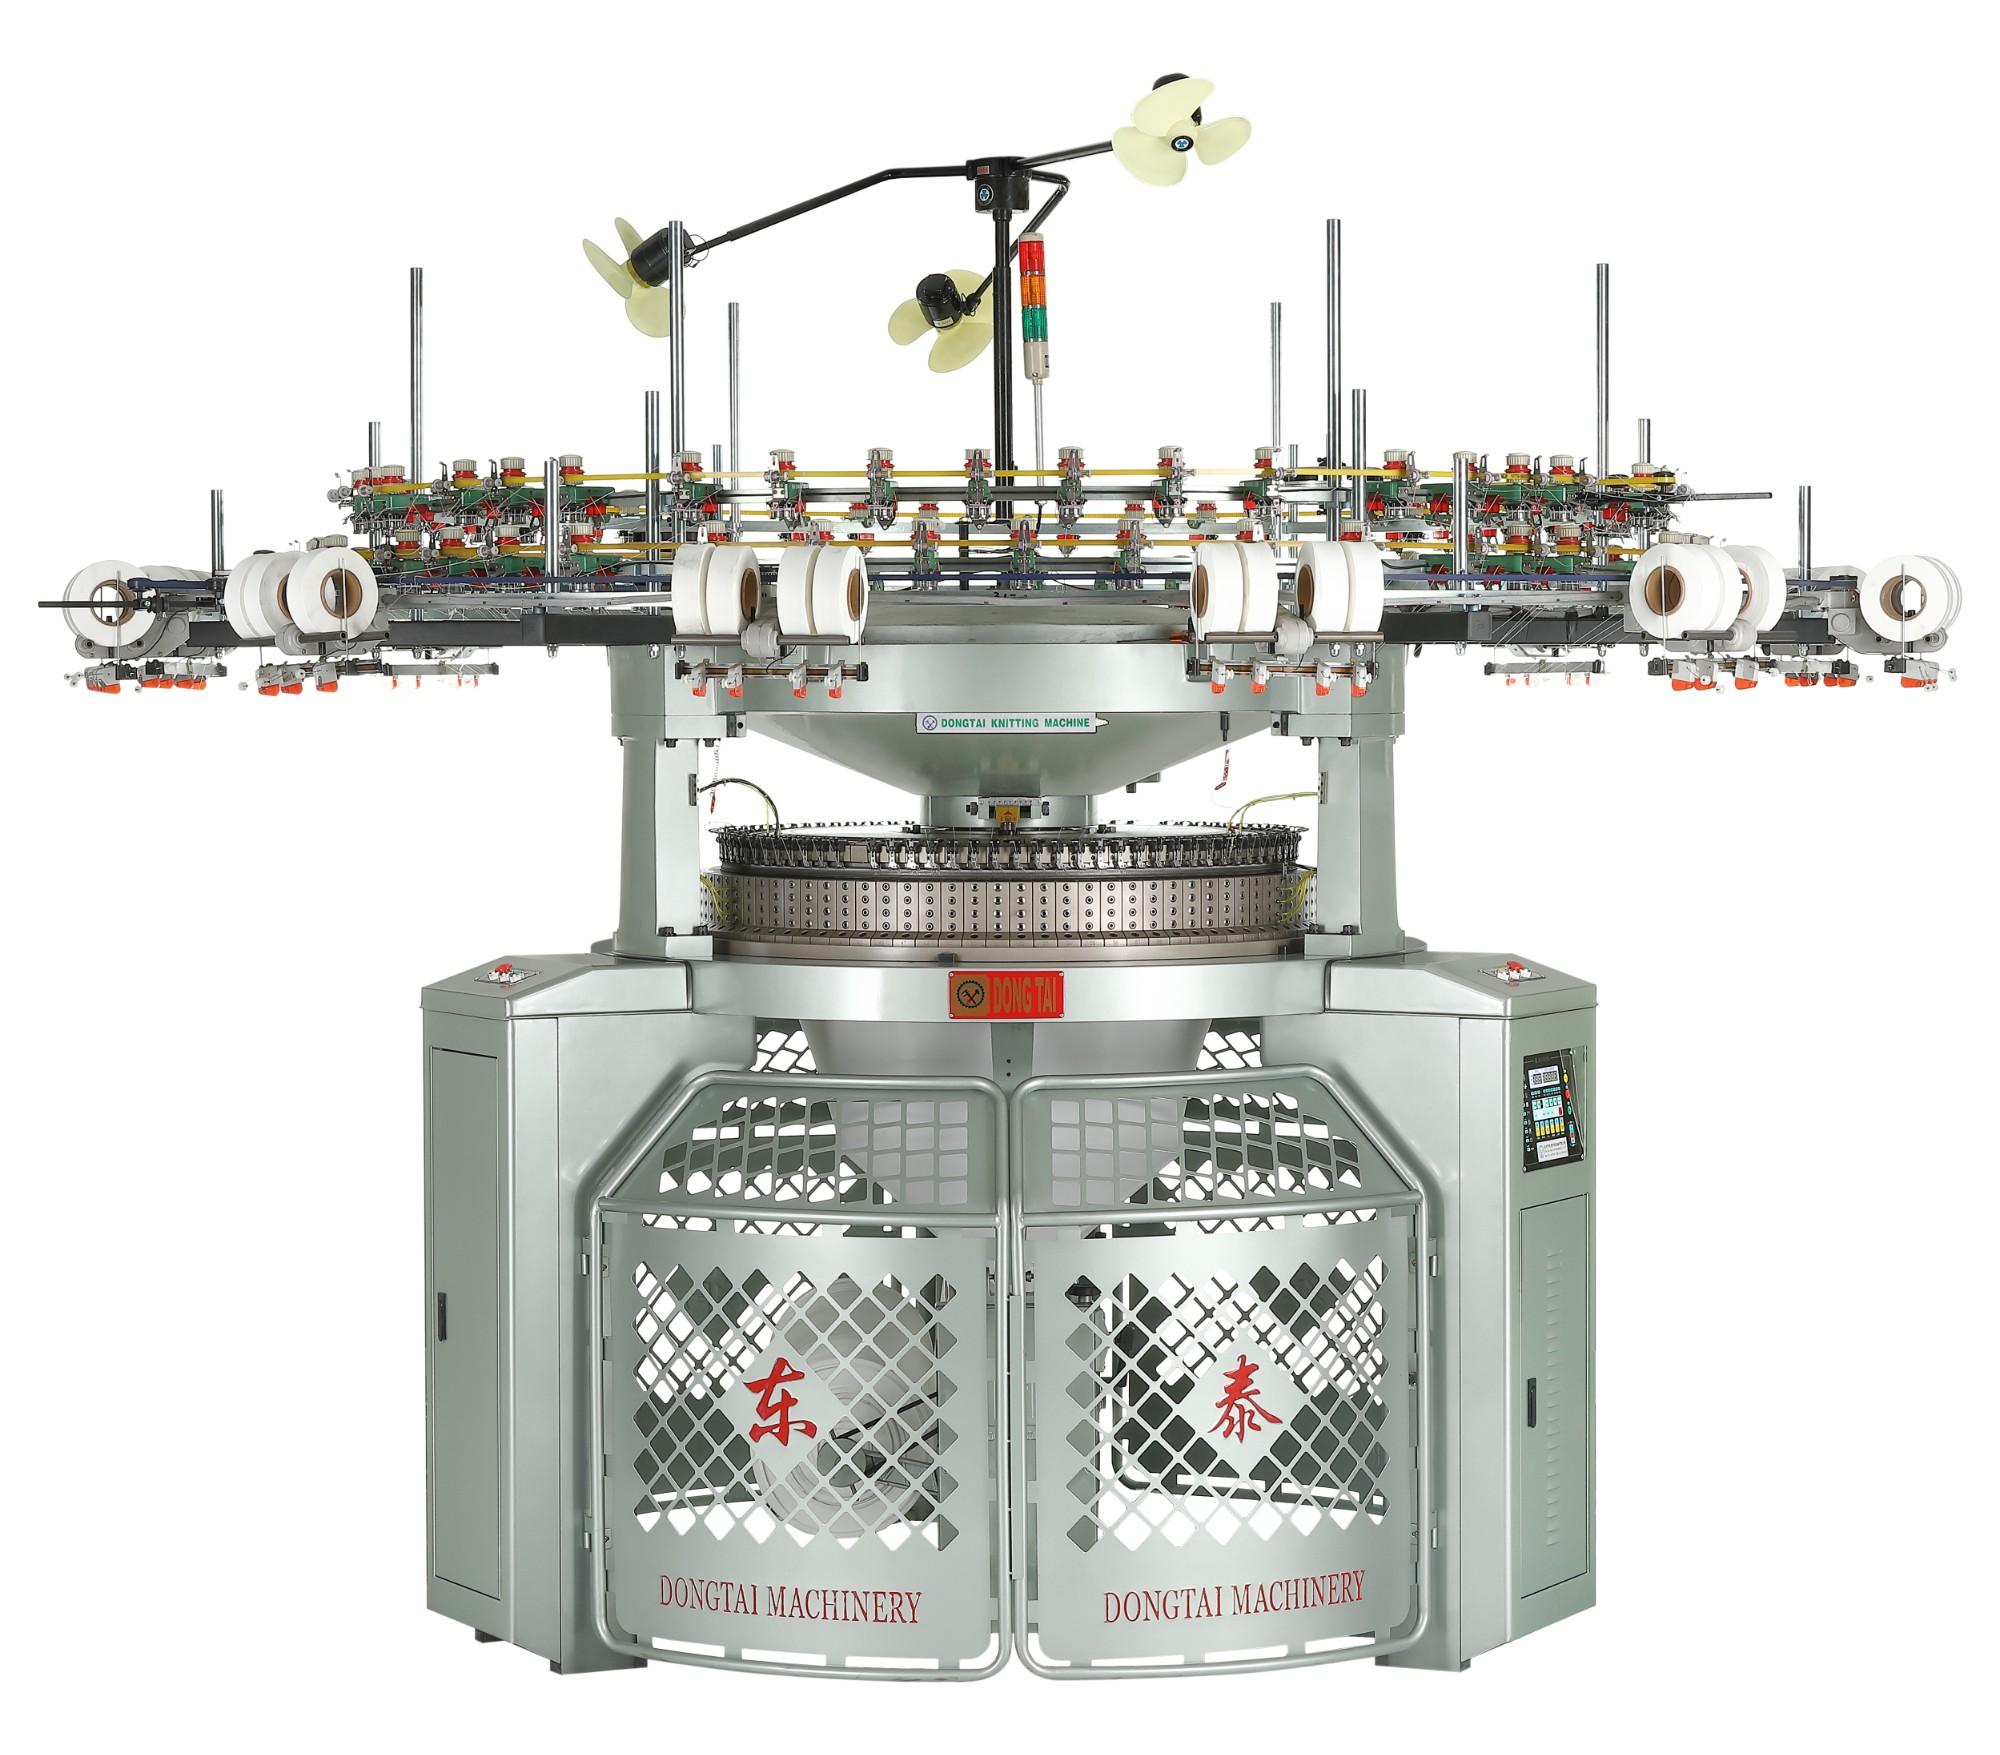 High Speed Interlock Circular Knitting Machine Manufacturers, High Speed Interlock Circular Knitting Machine Factory, Supply High Speed Interlock Circular Knitting Machine